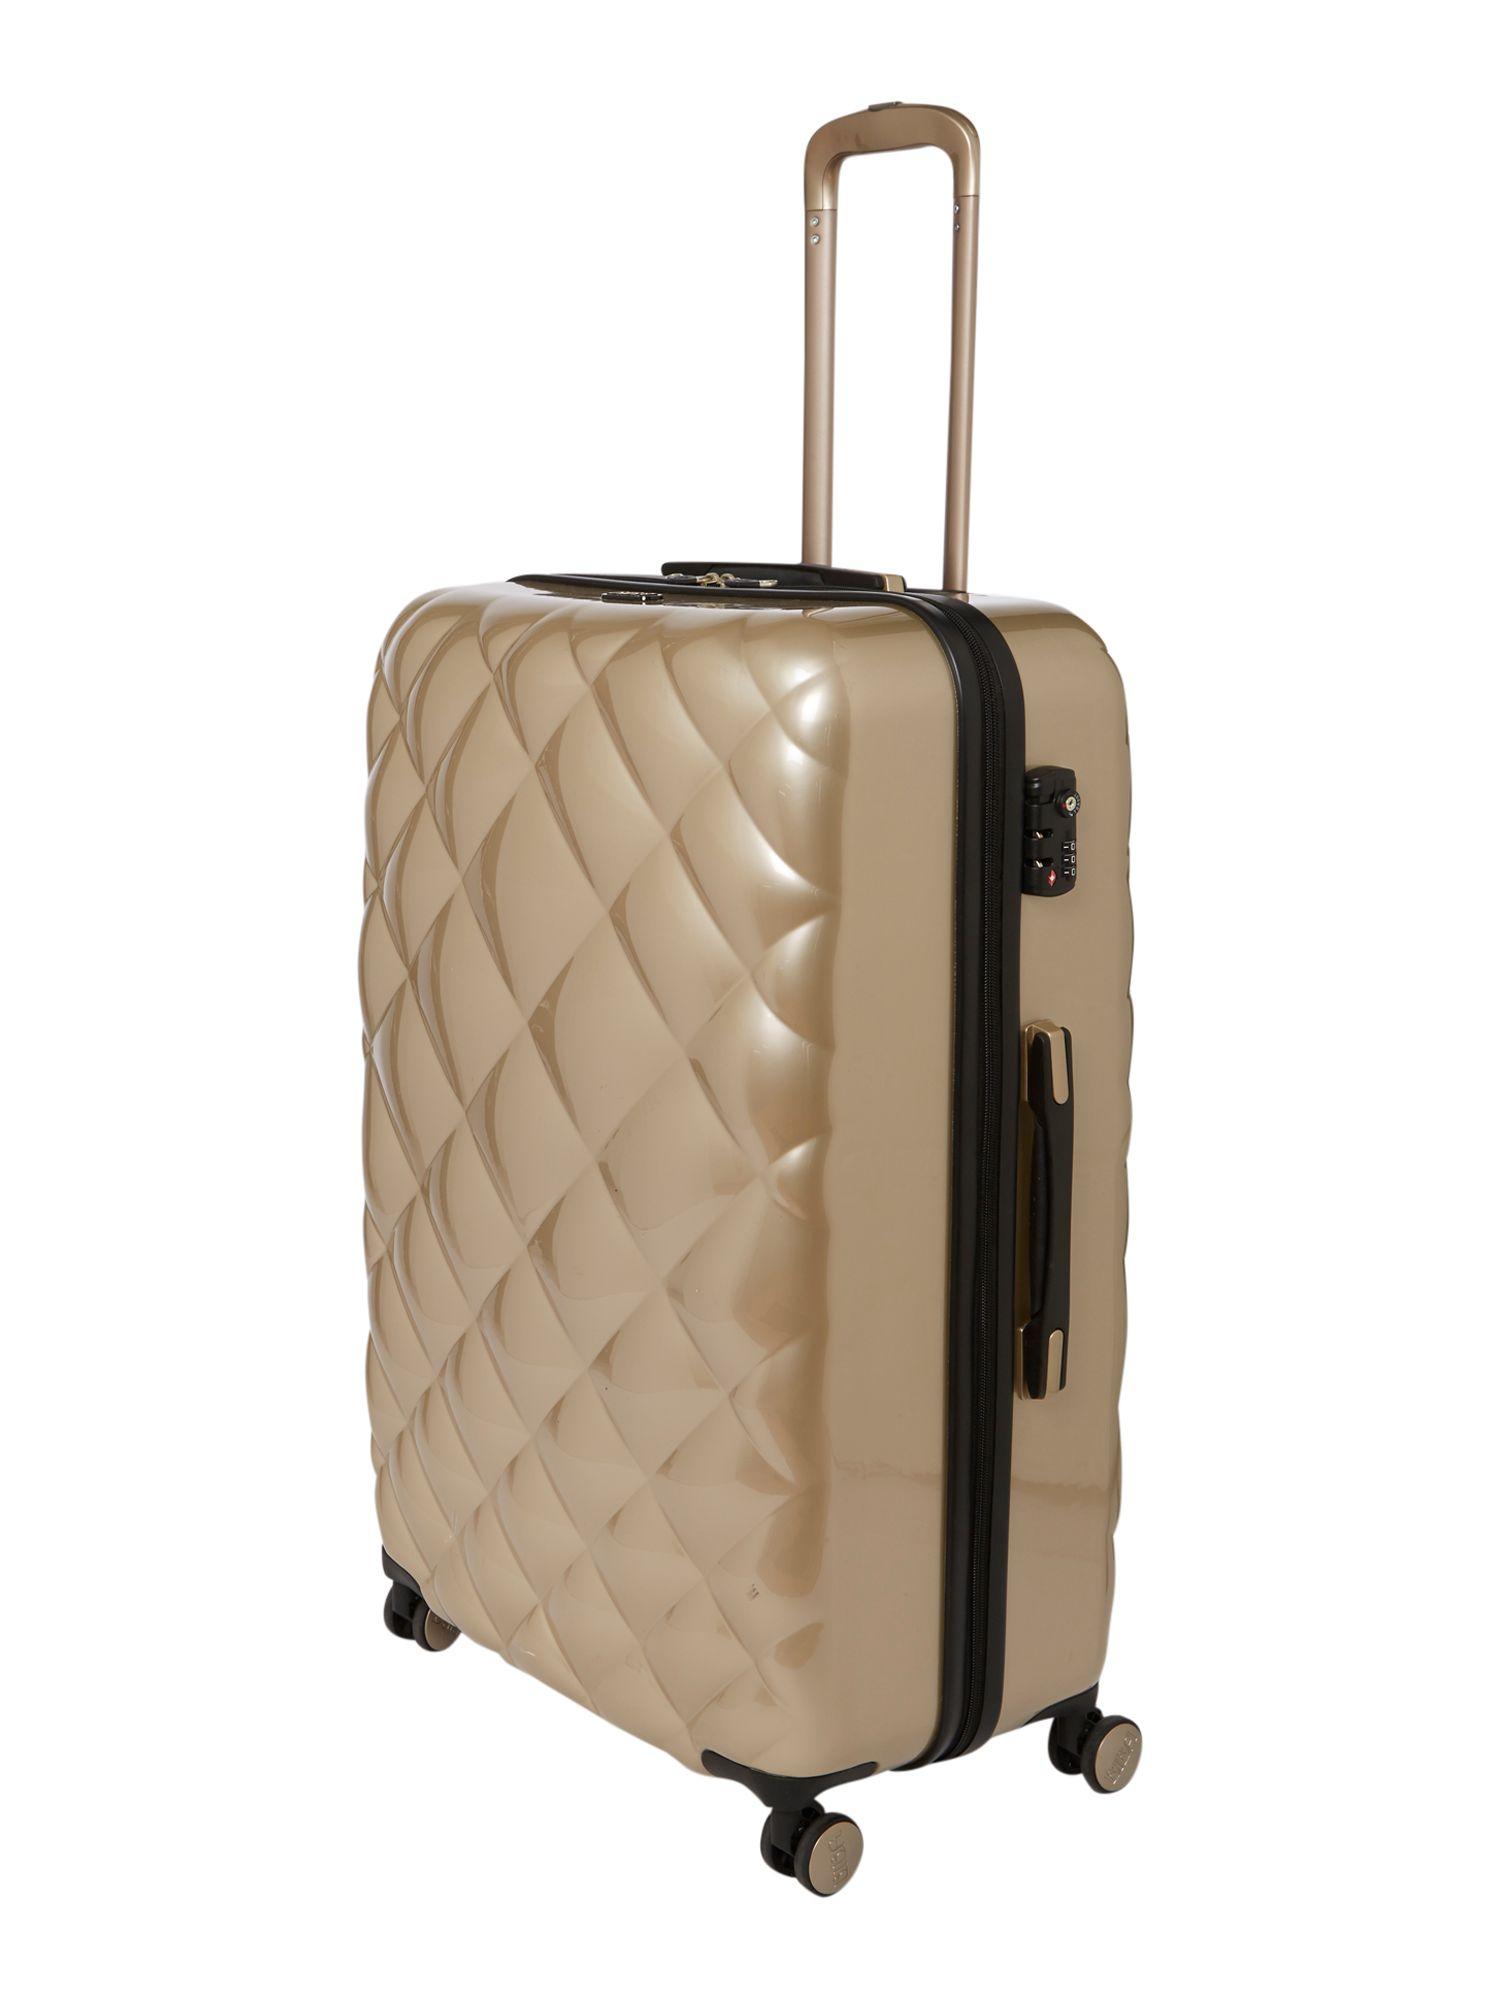 Biba Diamond Quilt Gold 8 Wheel Hard Large Suitcase in Metallic | Lyst